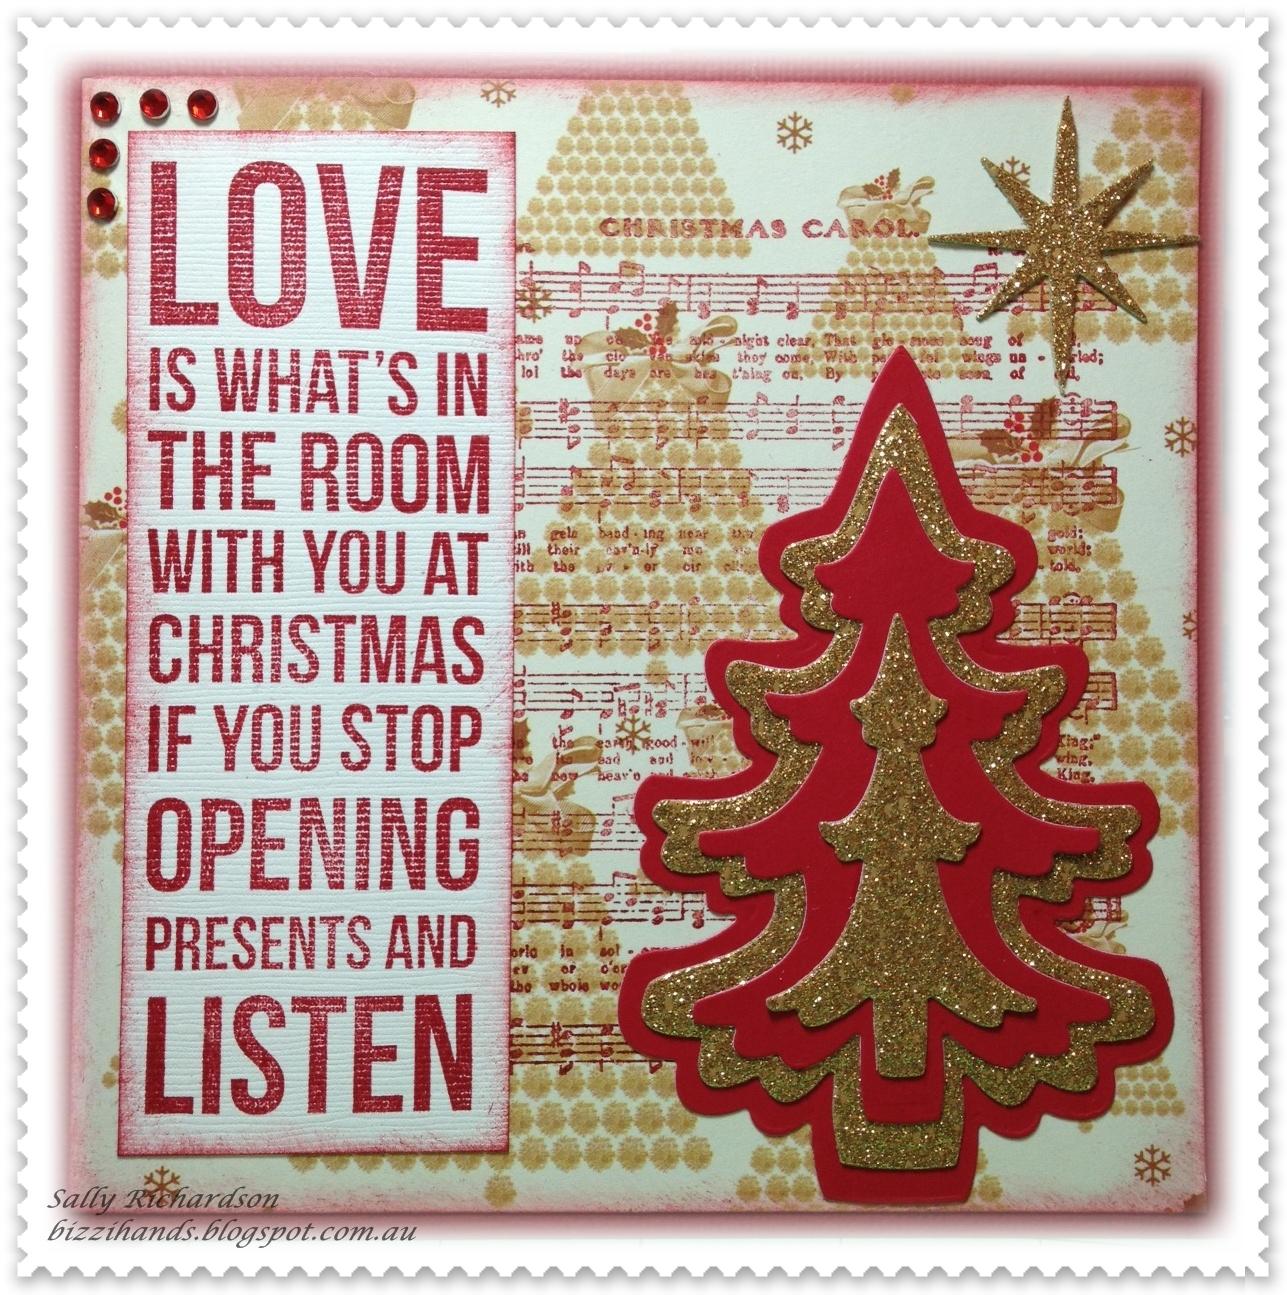 Until Christmas 70 Days Till Christmas.Bizzy Becs Store Blog Ho Ho Ho 96 Days Until Christmas